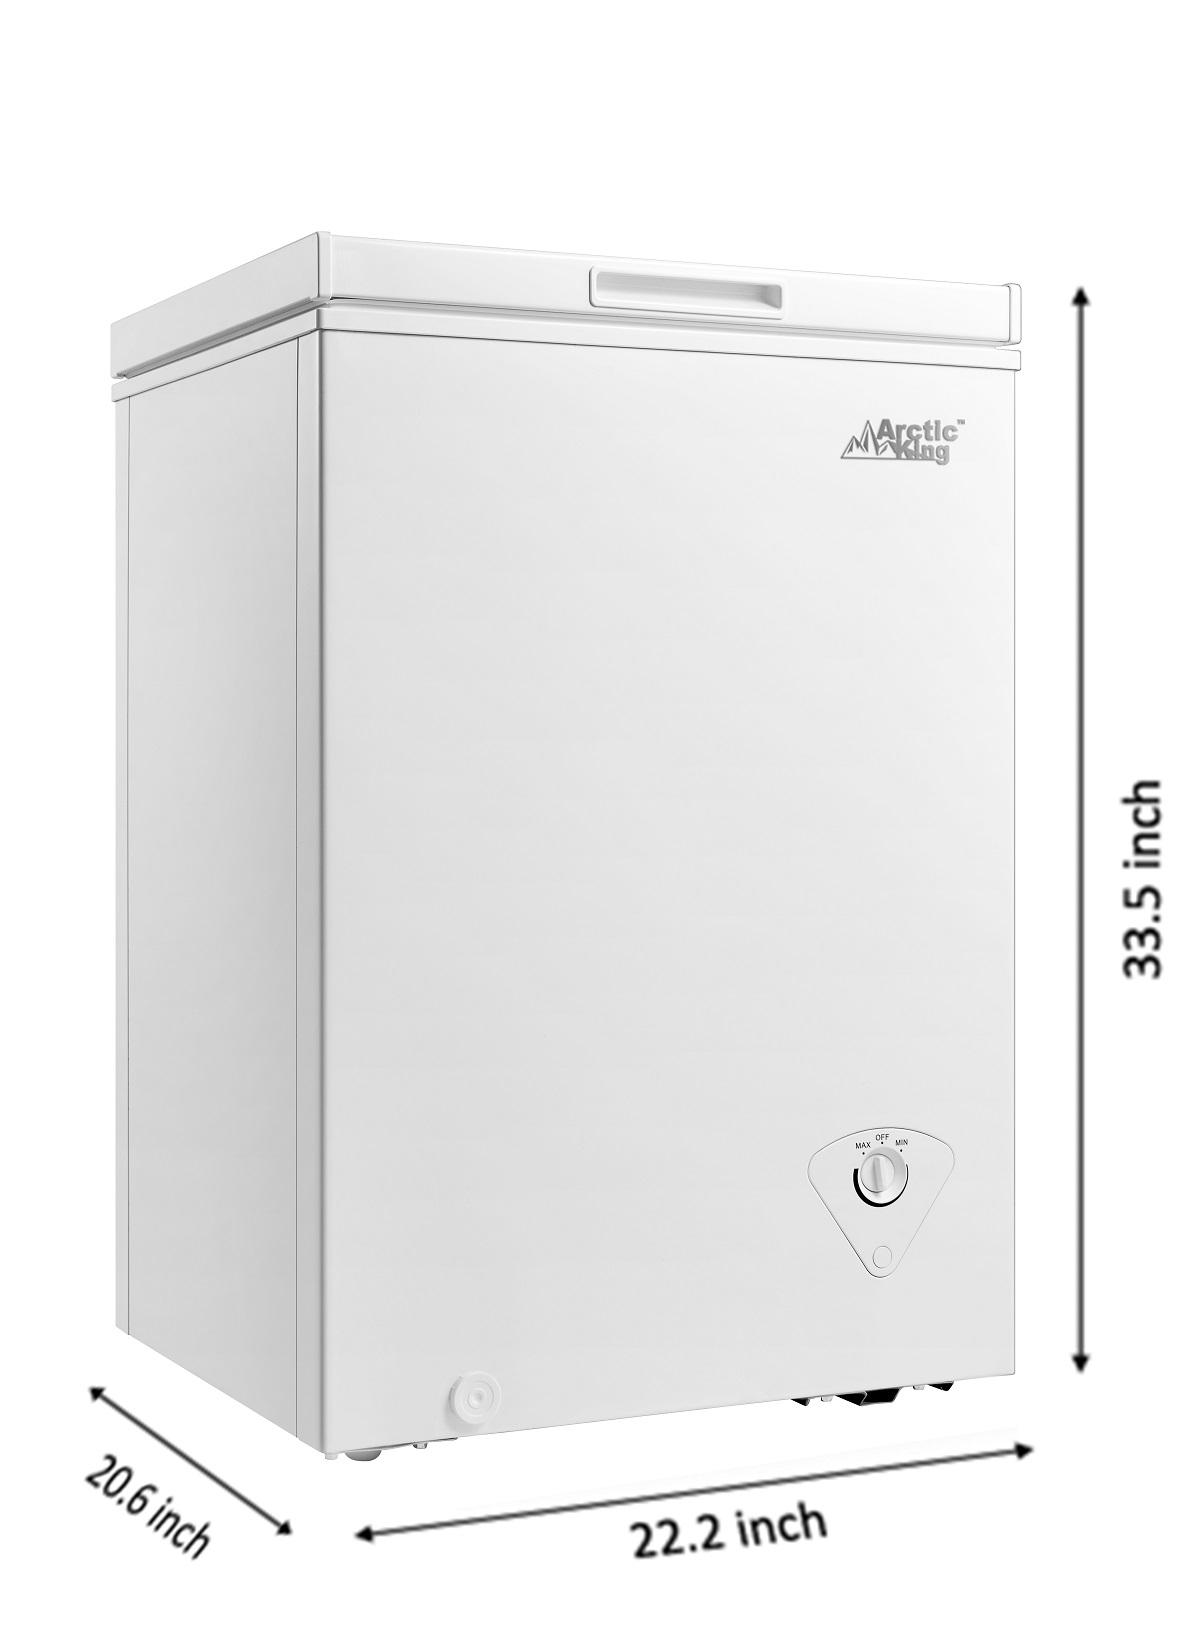 Arctic King 3.5 Cu Ft Chest Freezer Specs